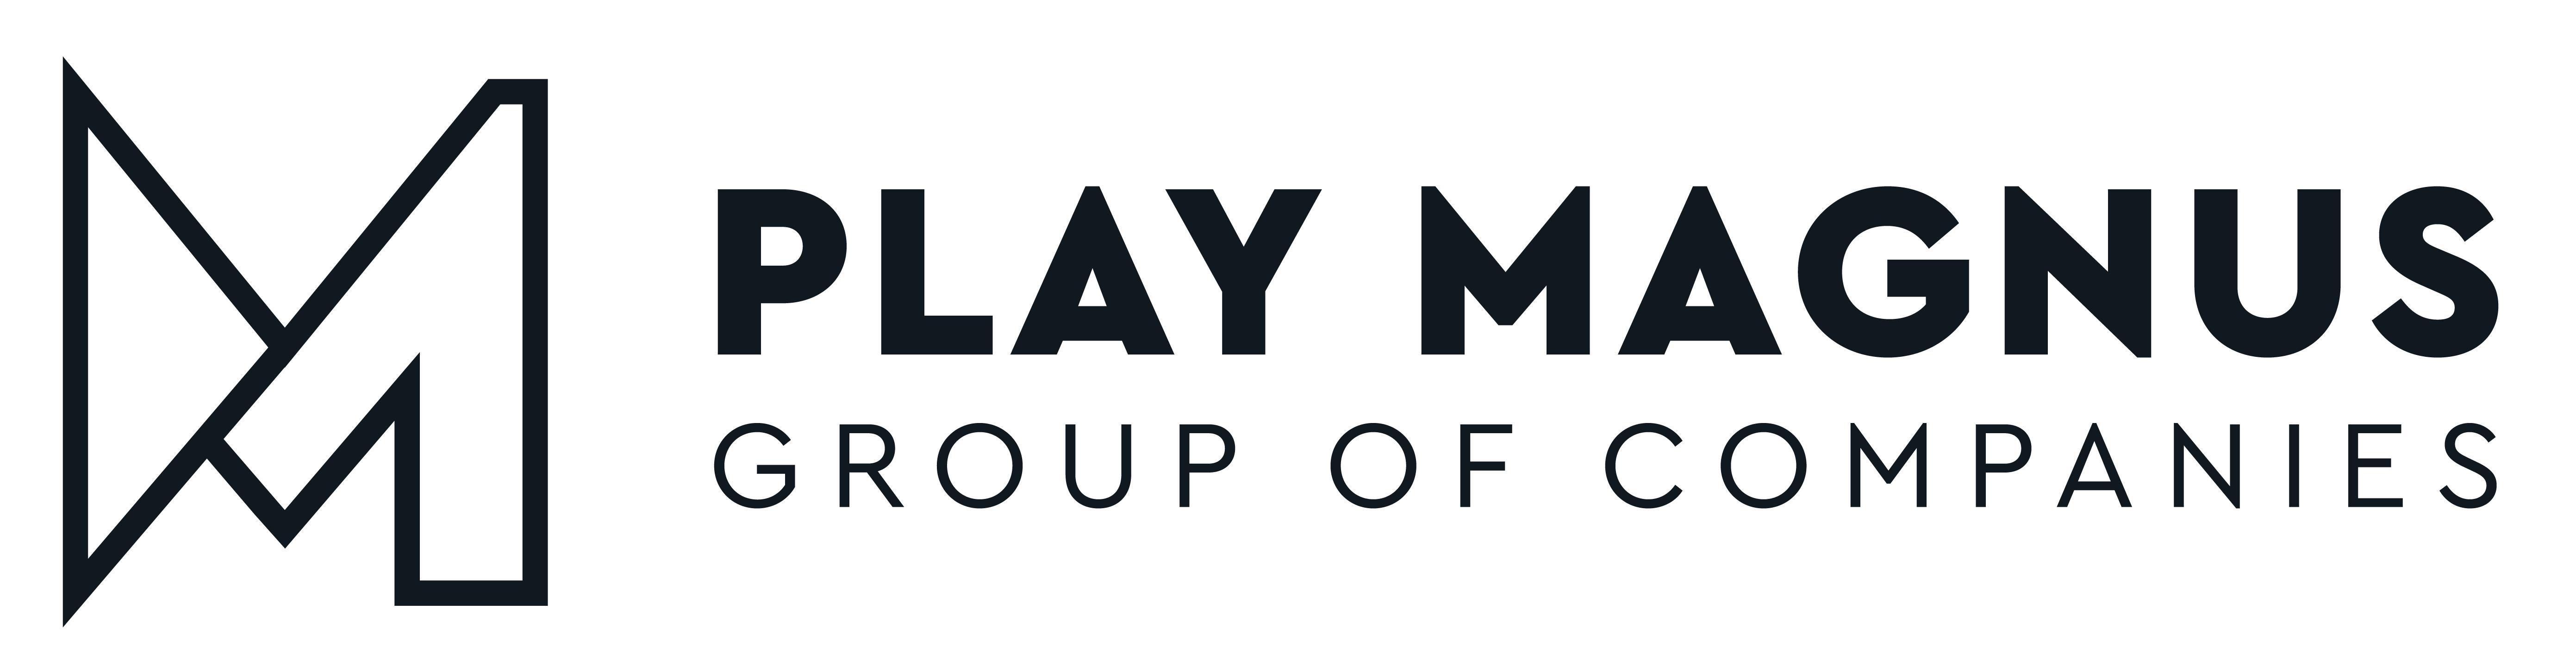 Play Magnus Group